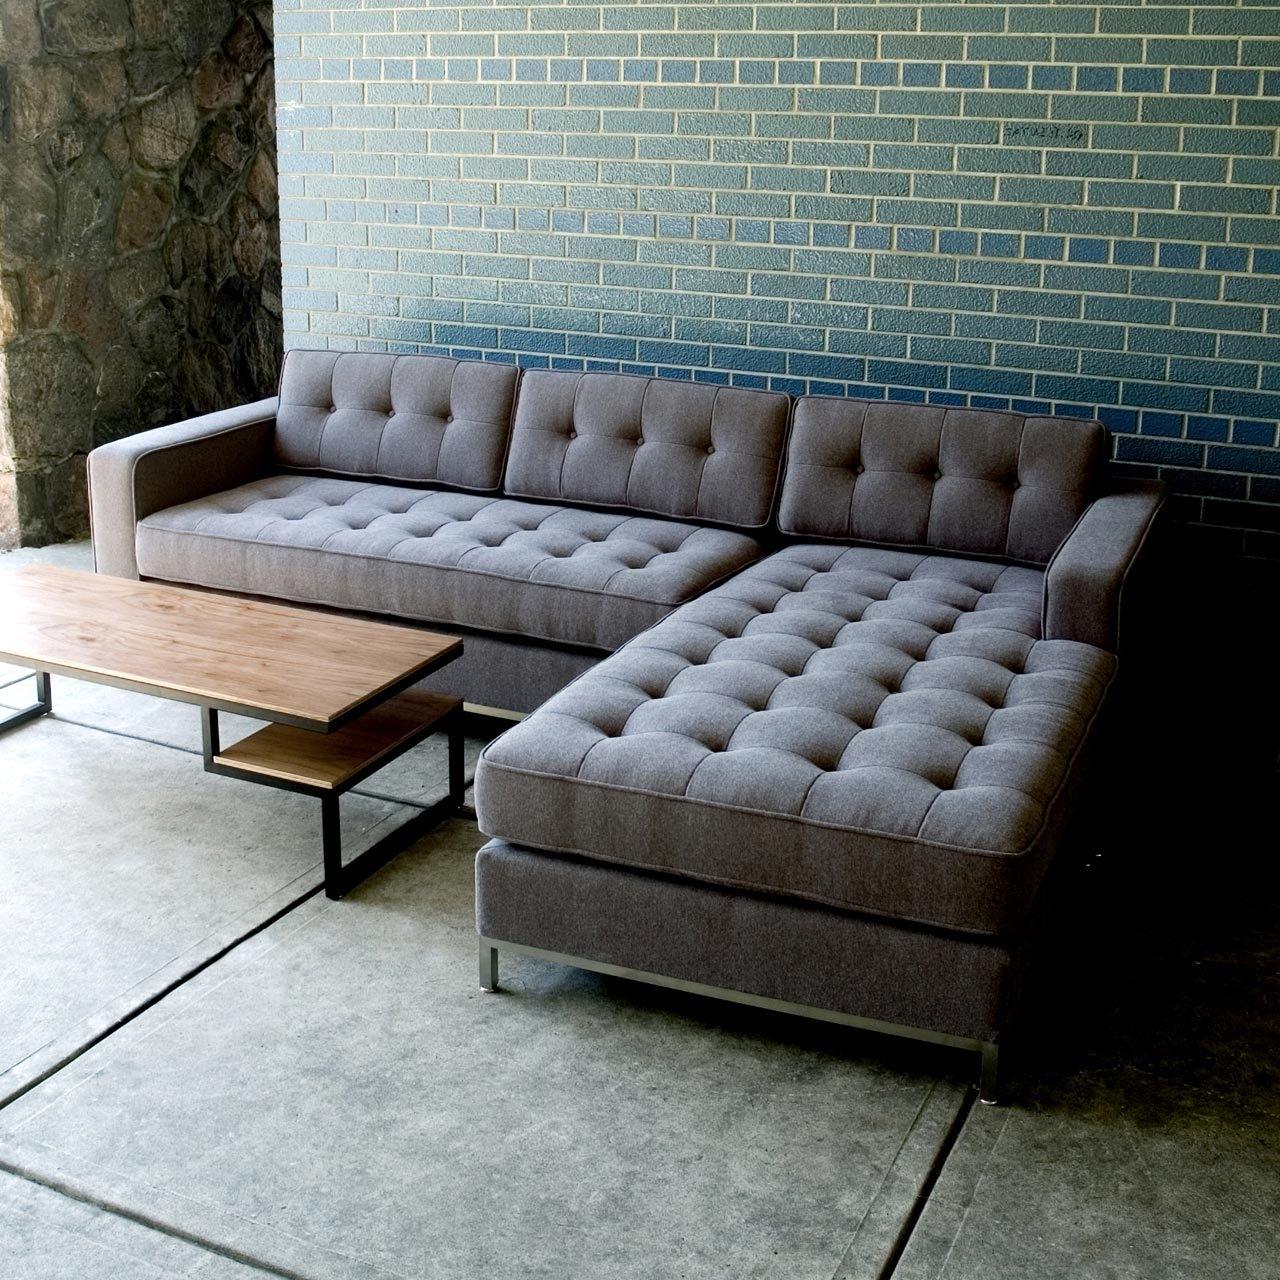 Pigment – Gus Modern Jane Bi Sectional Sofa, (Http://www Throughout Widely Used Jane Bi Sectional Sofas (View 2 of 15)